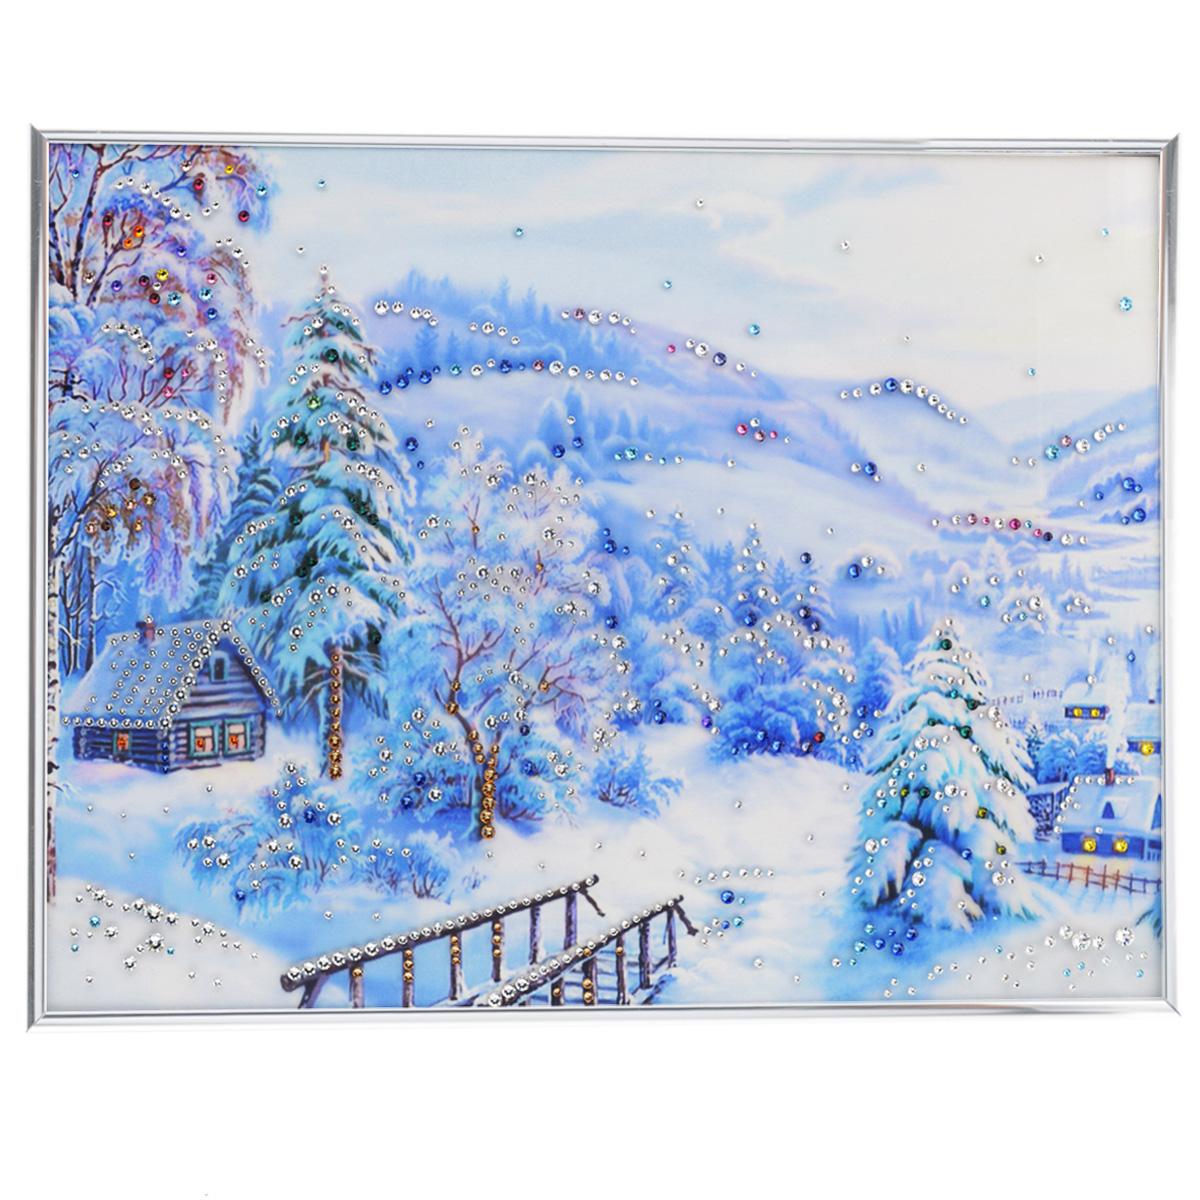 Картина с кристаллами Swarovski Зима, 40 х 30 см картины в квартиру картина etude 2 102х130 см